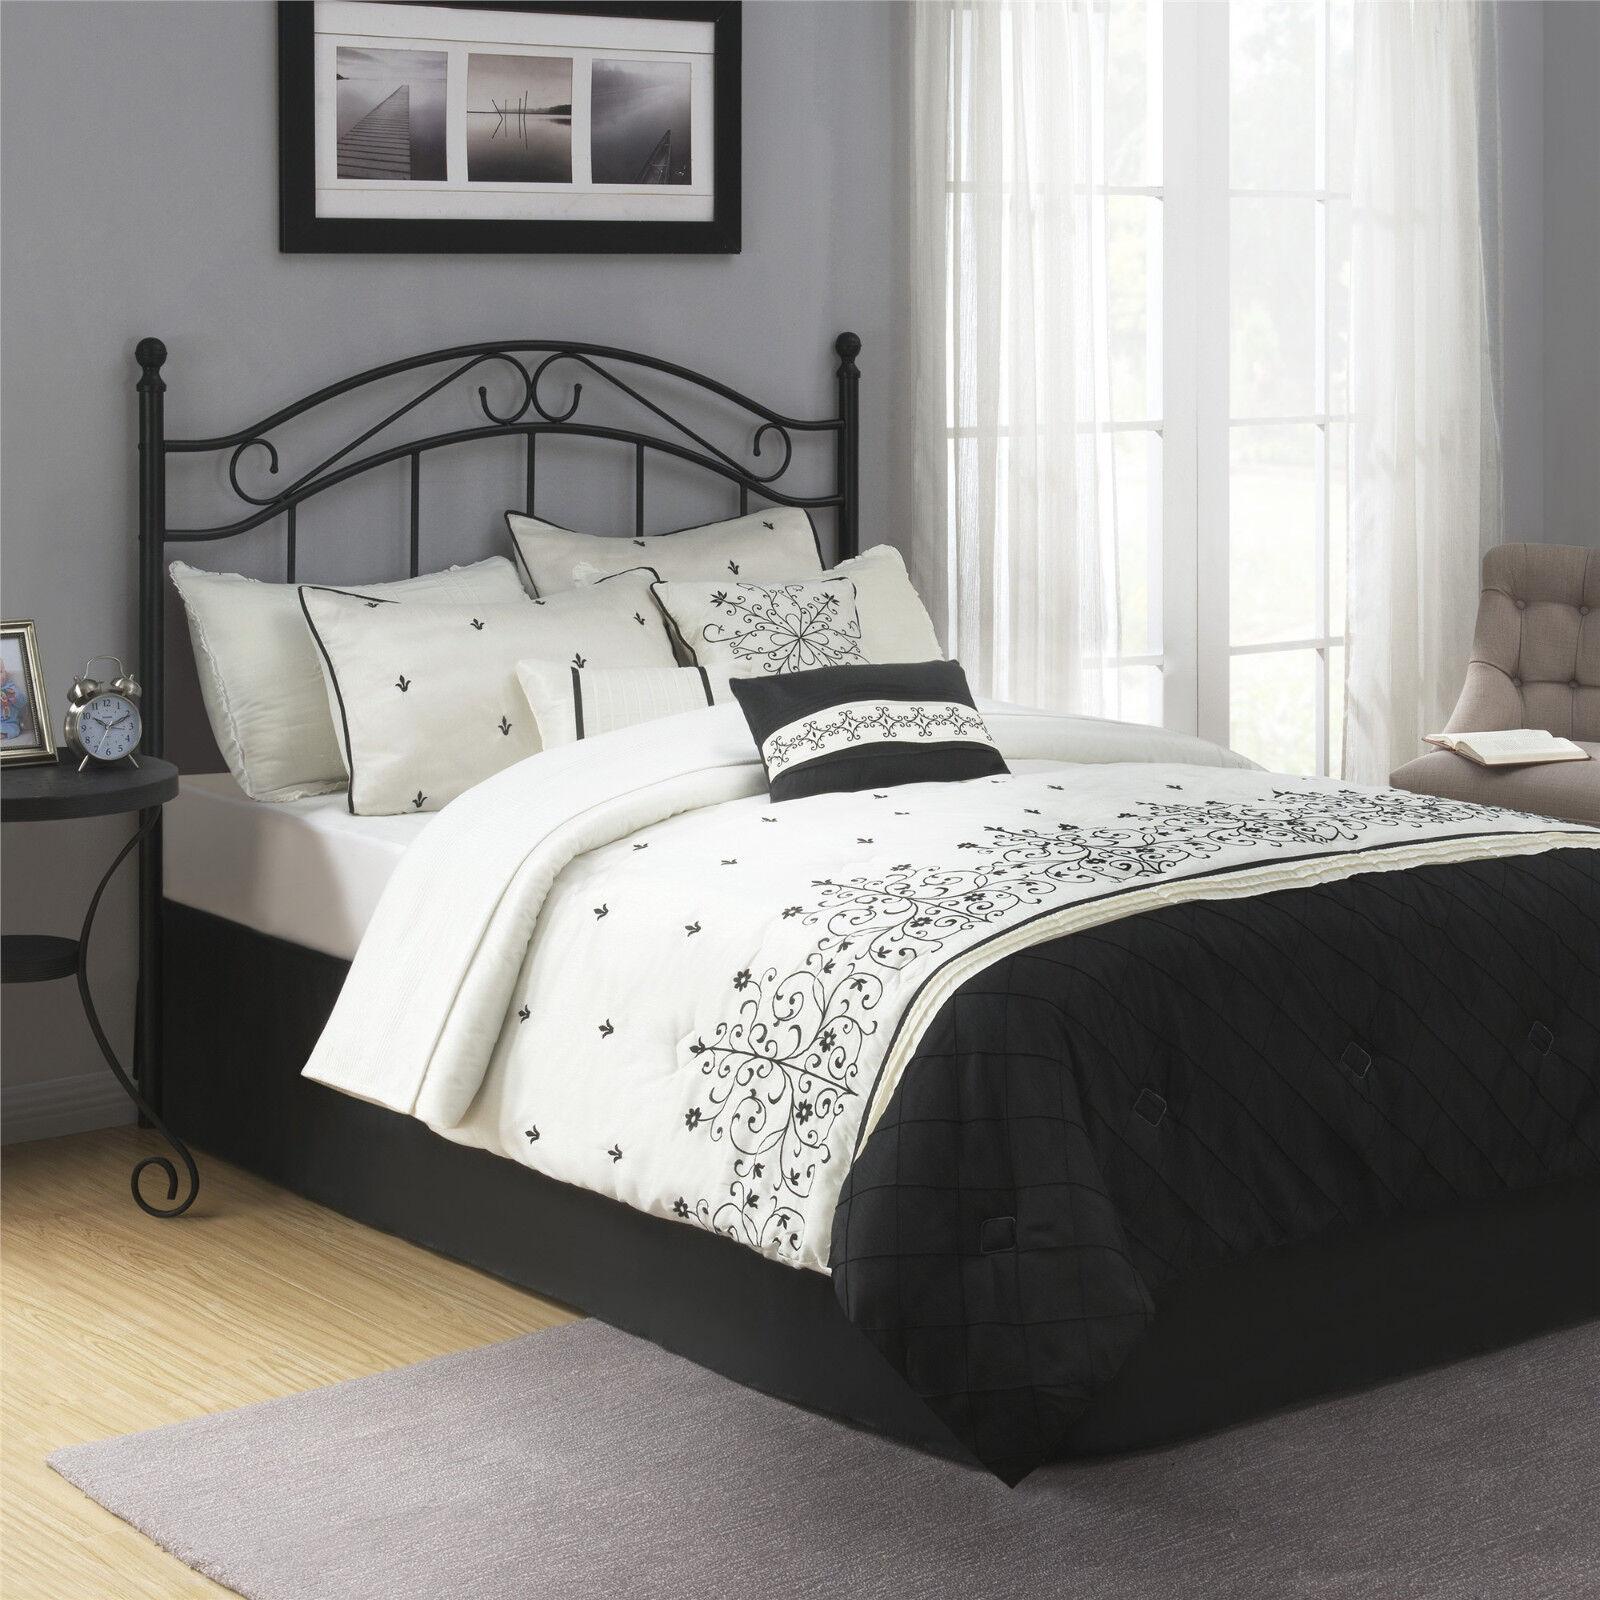 Metal headboard bed frame - Full Size Metal Headboard Queen Full Size Metal Bedroom Headboard Frame Furniture Dorm Bed Assorted Colors